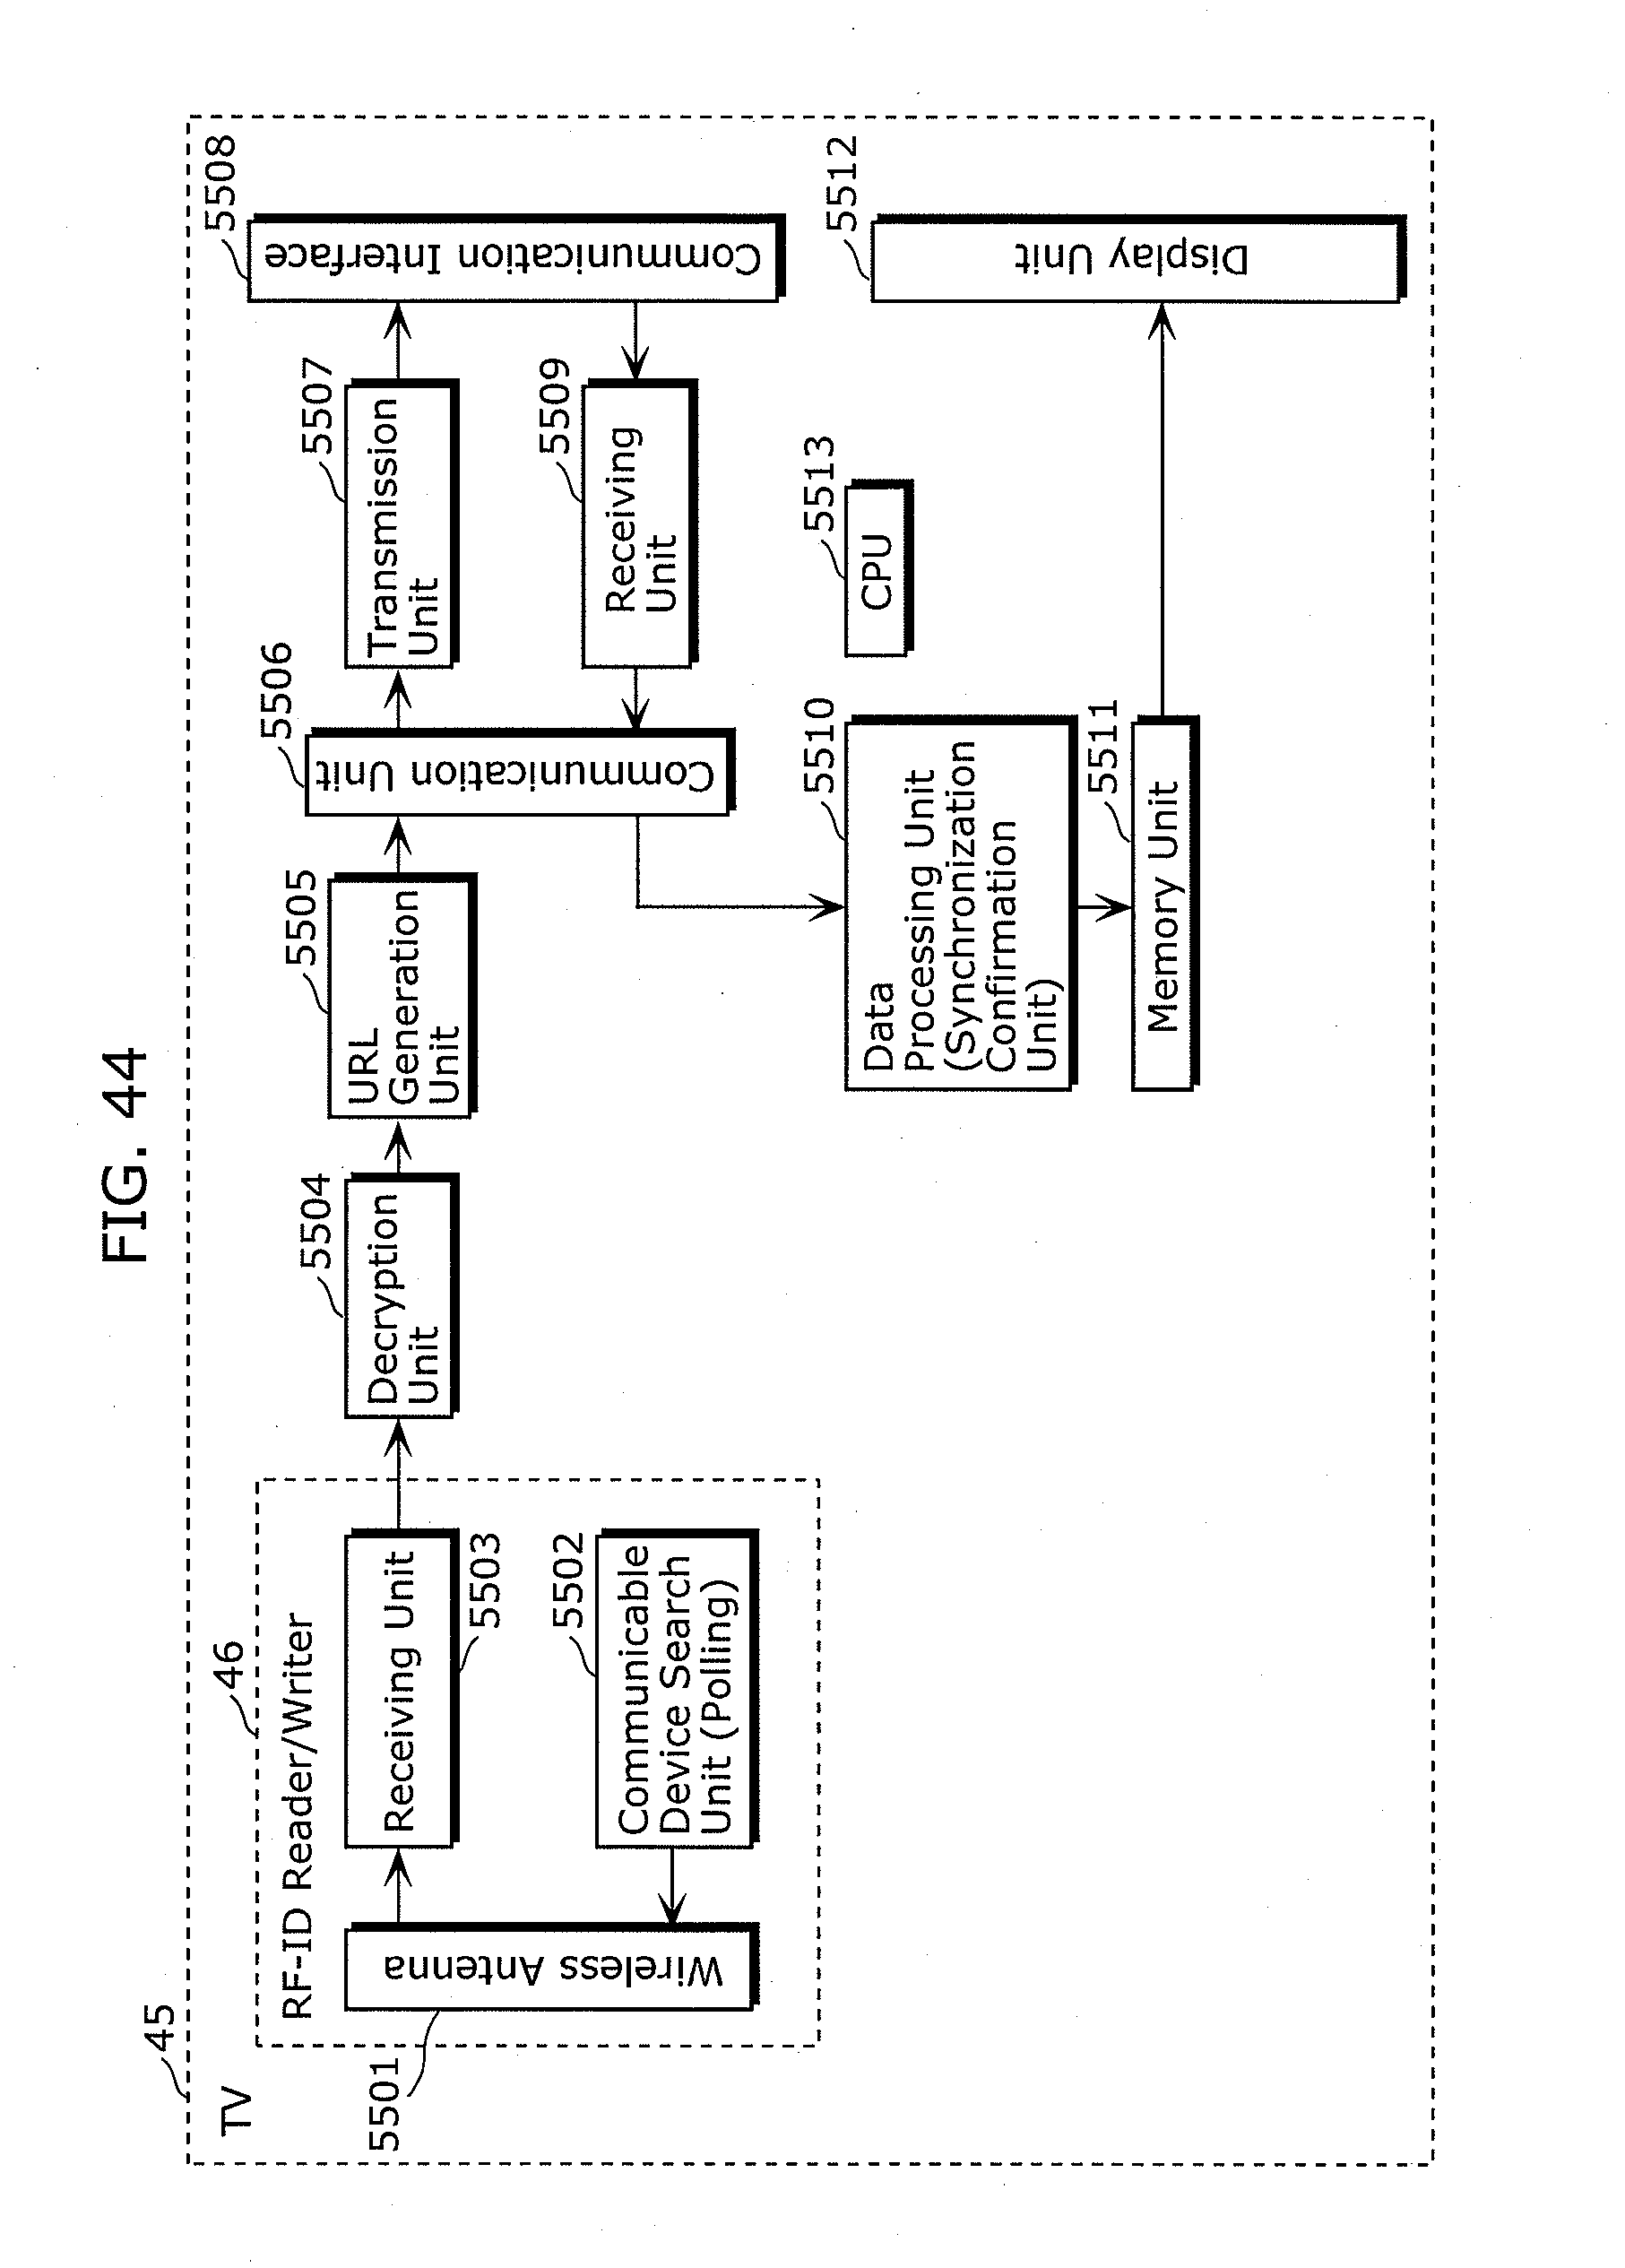 US20130247117A1 - Communication device - Google Patents on